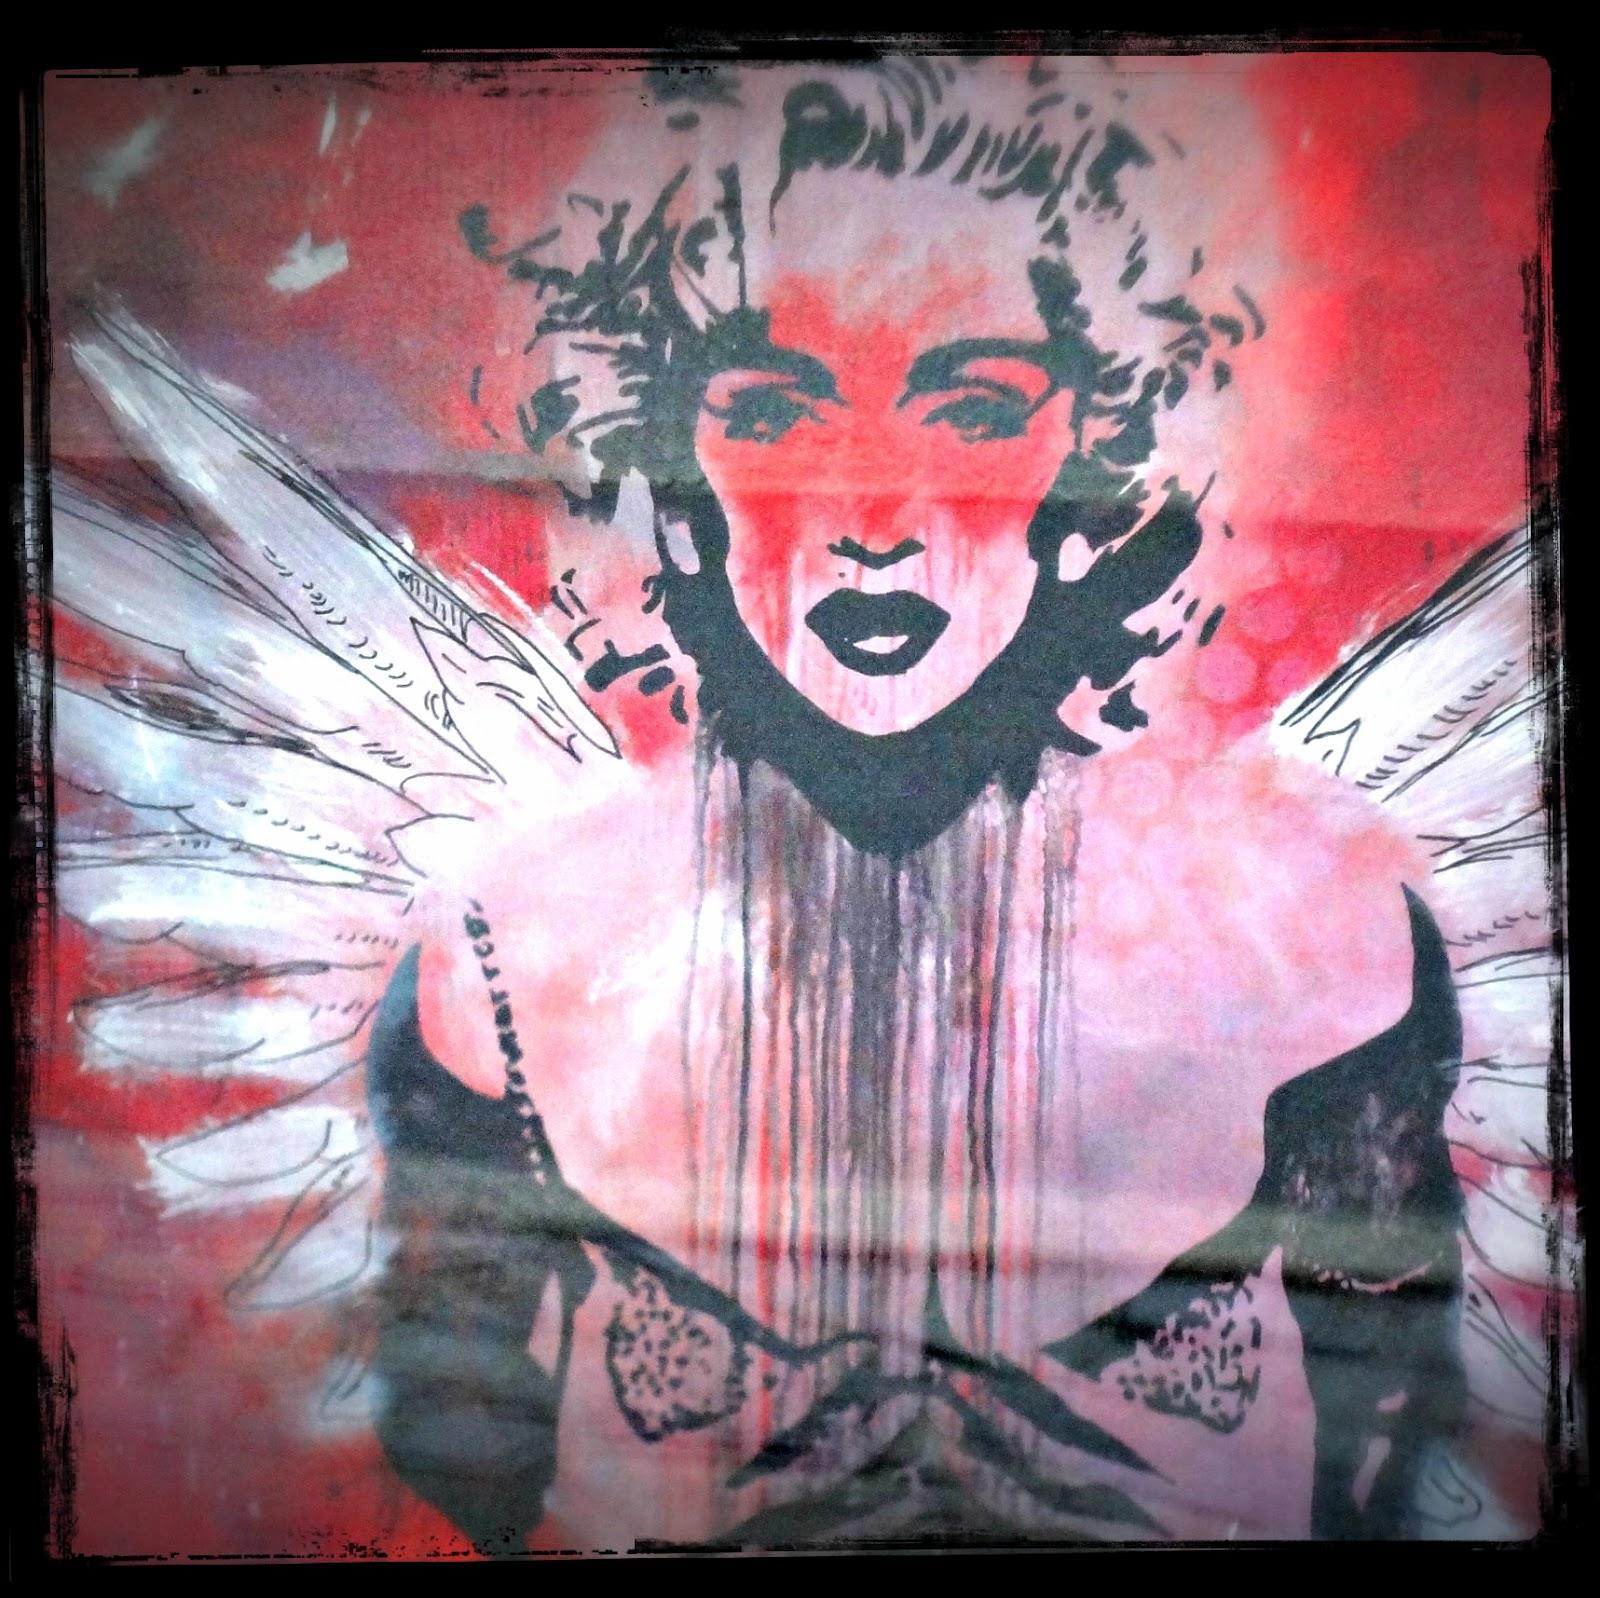 http://4.bp.blogspot.com/-hfBGzyX-pBI/T8CsjoBXO8I/AAAAAAAAA9k/VDnxzg_AJRk/s1600/madonna+bomhuset.jpg